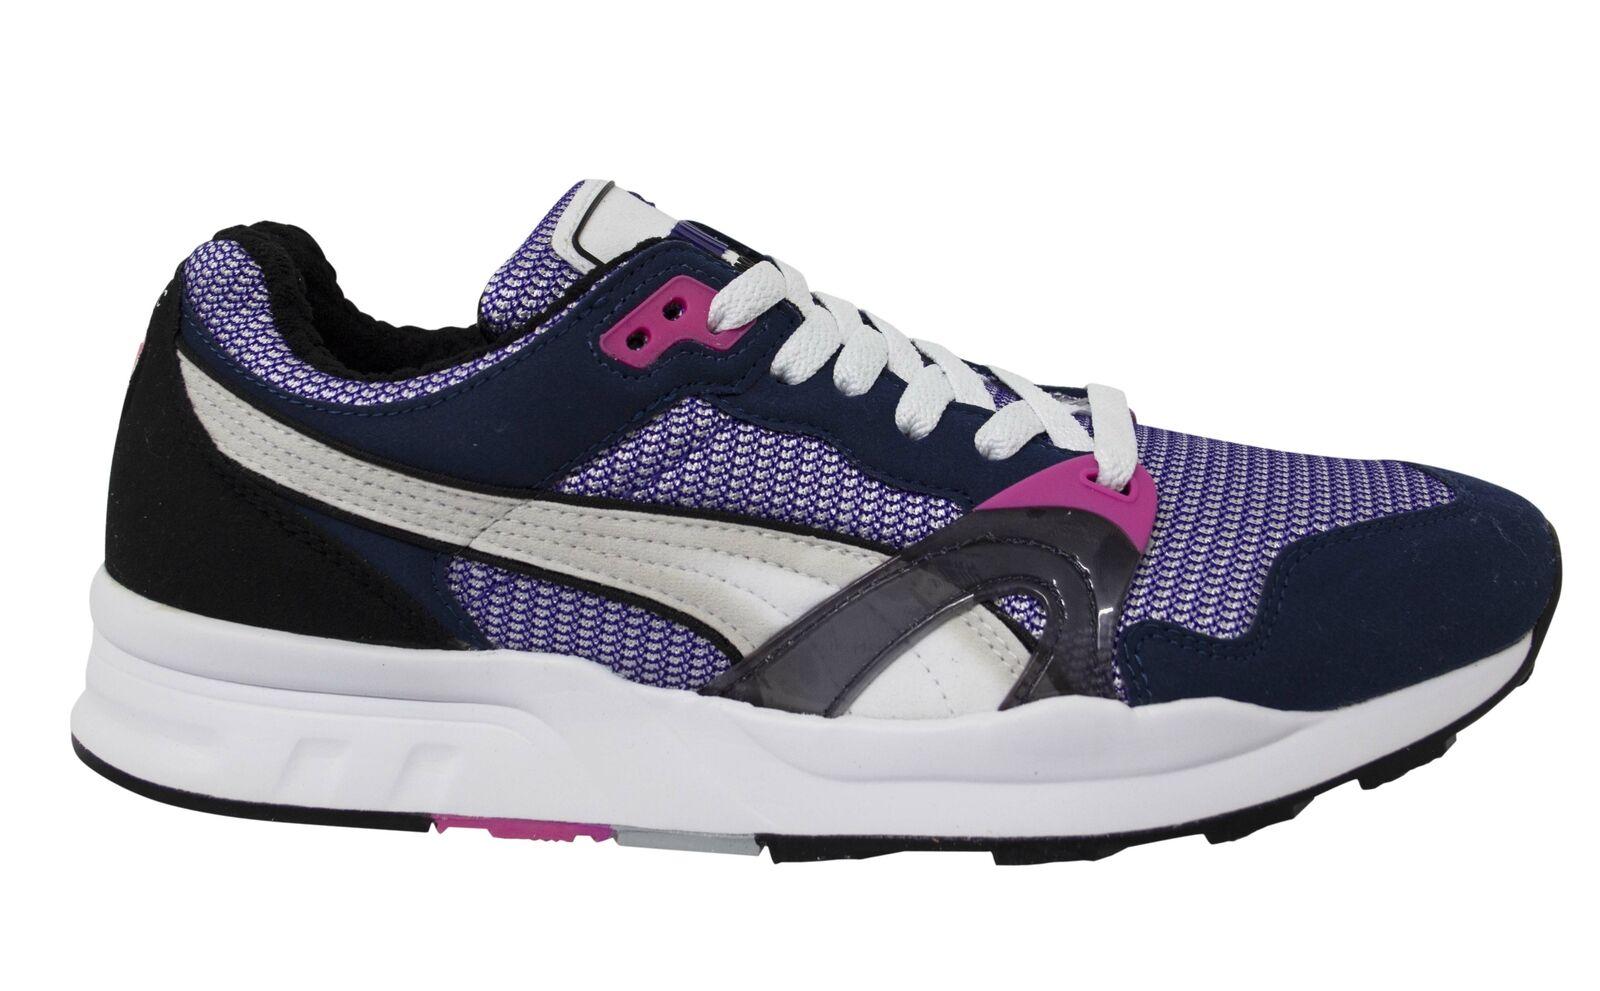 Puma Trinomic XT 1 Plus Blue Lace Up Mens Trainers Running Shoes 355867 07